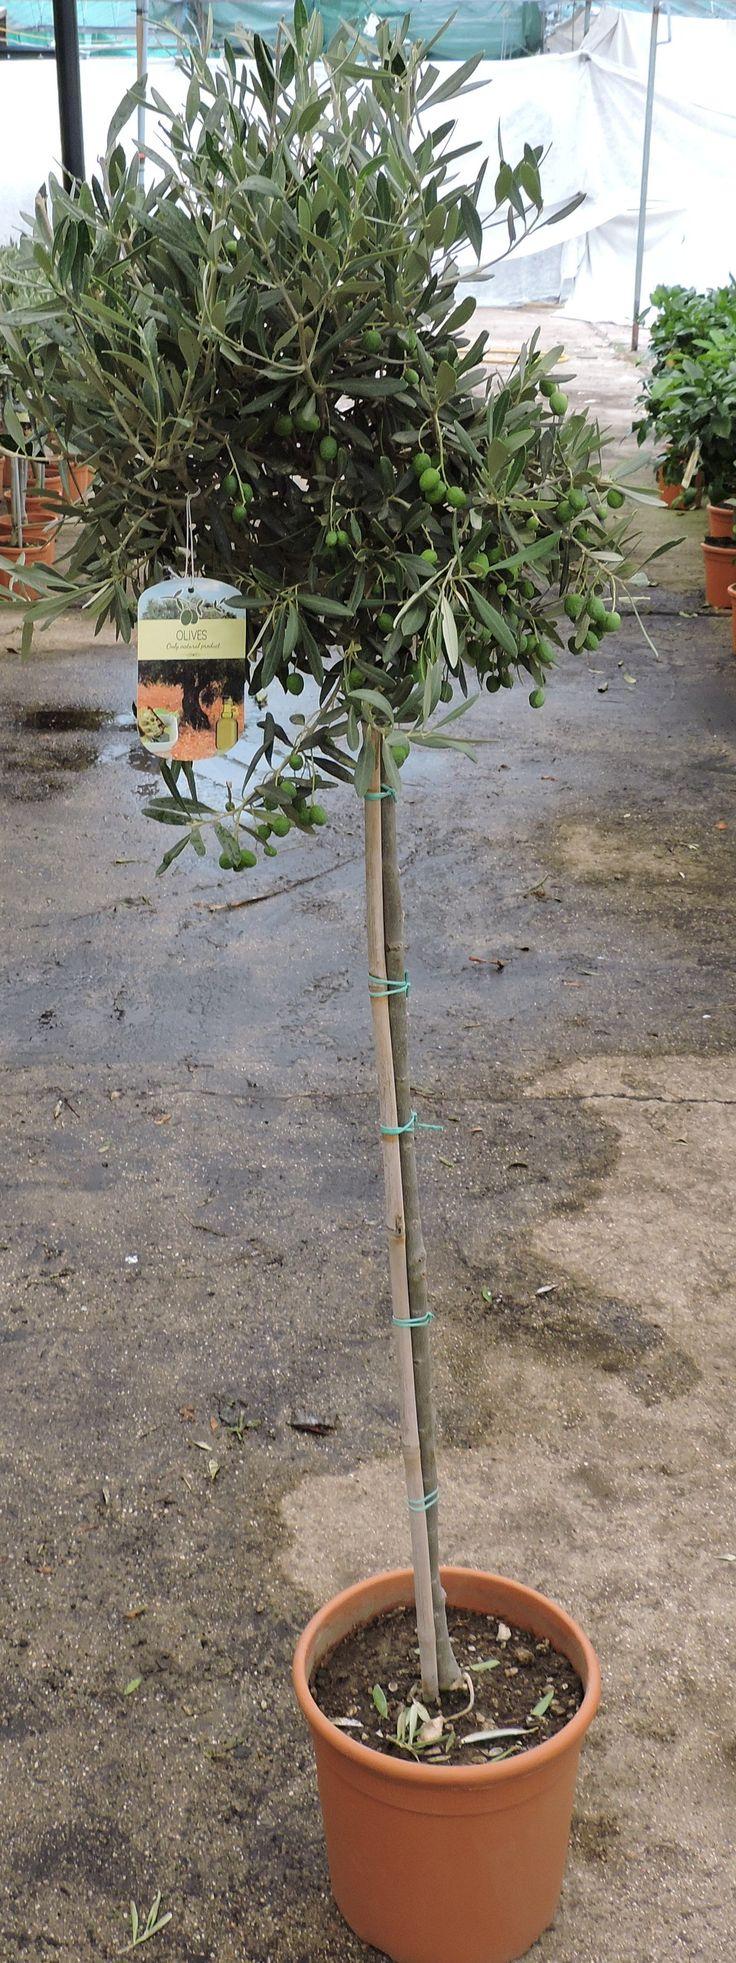 Olive Standard 140cm+ height, 7.5ltr decopot